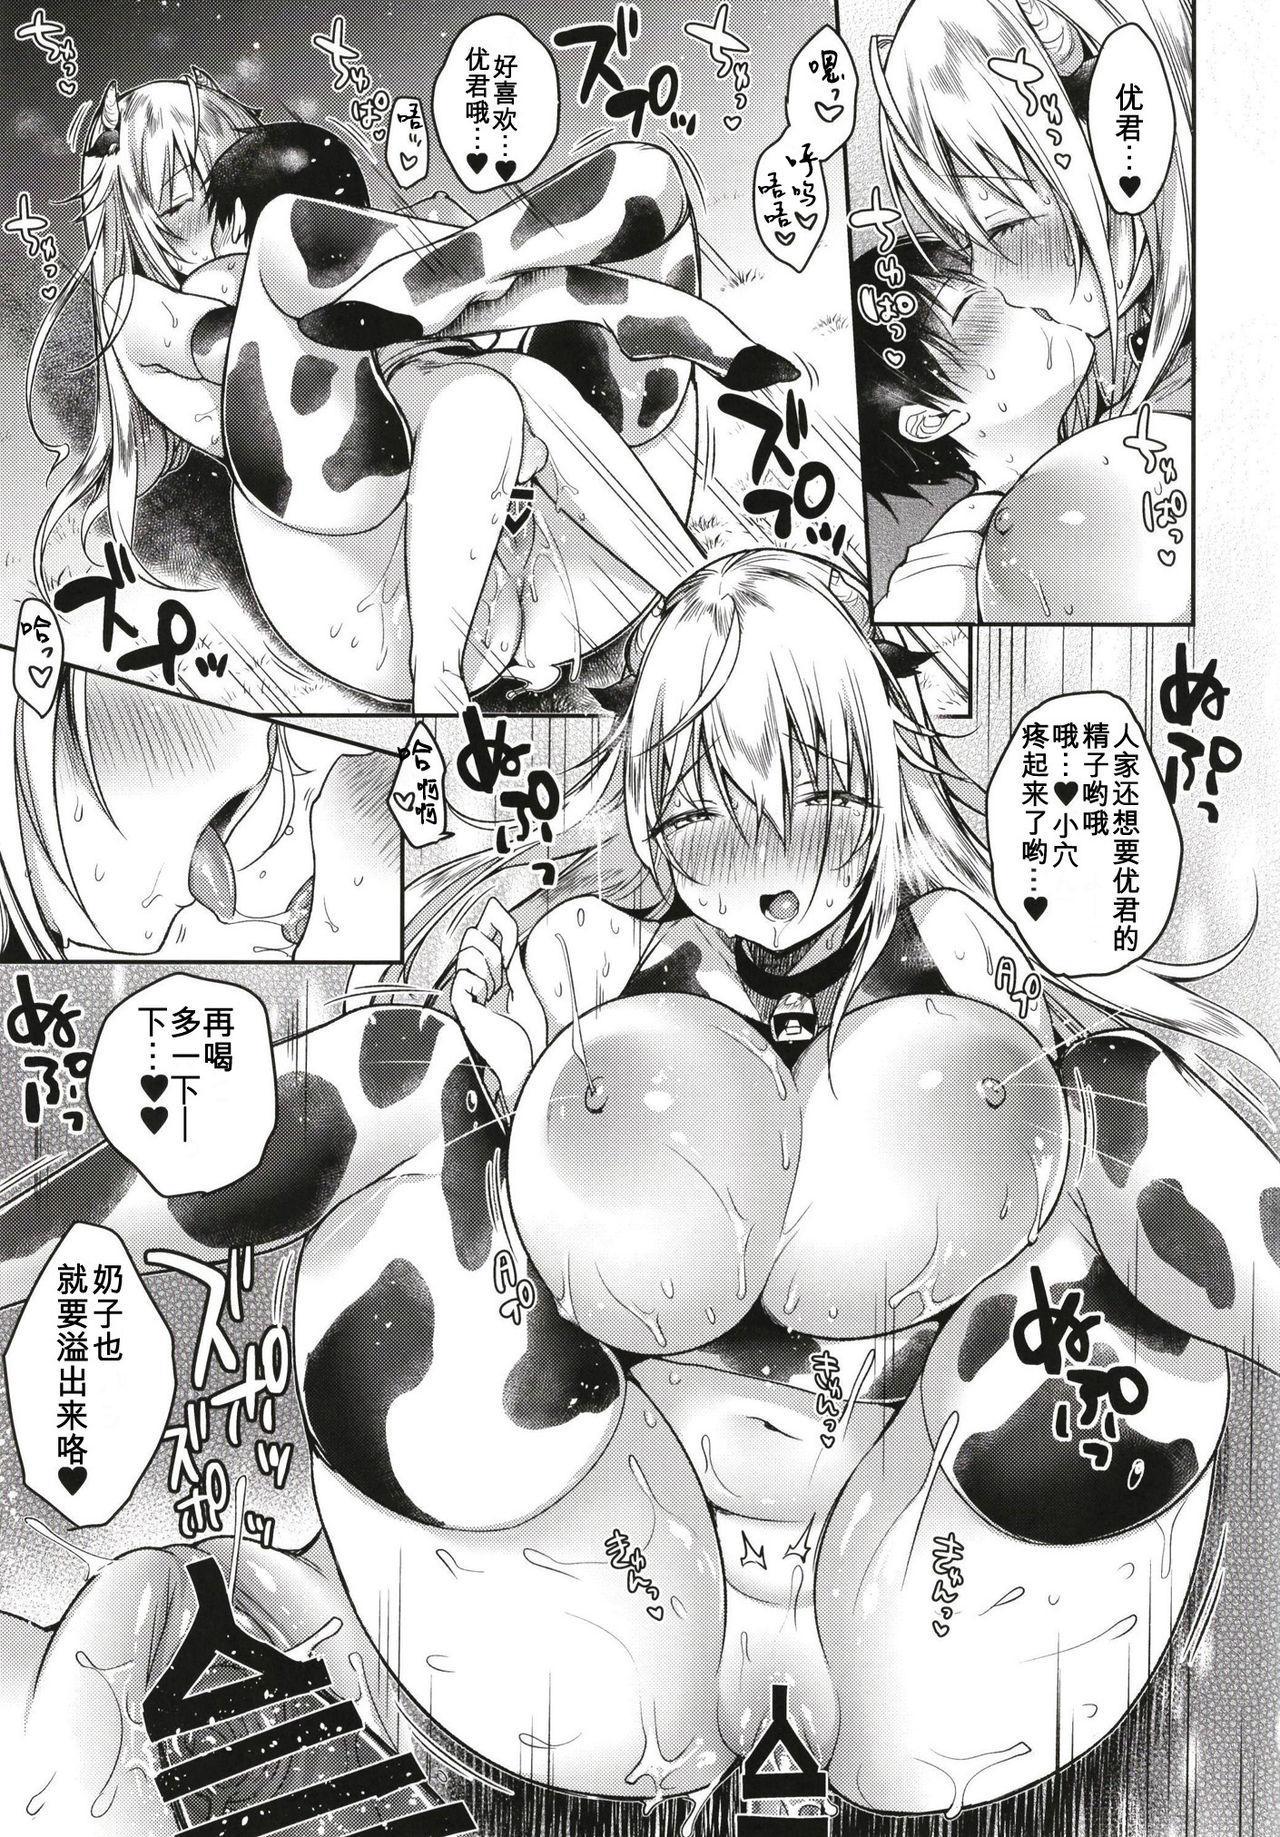 Makiba no Bonyuu Nikki 4 20